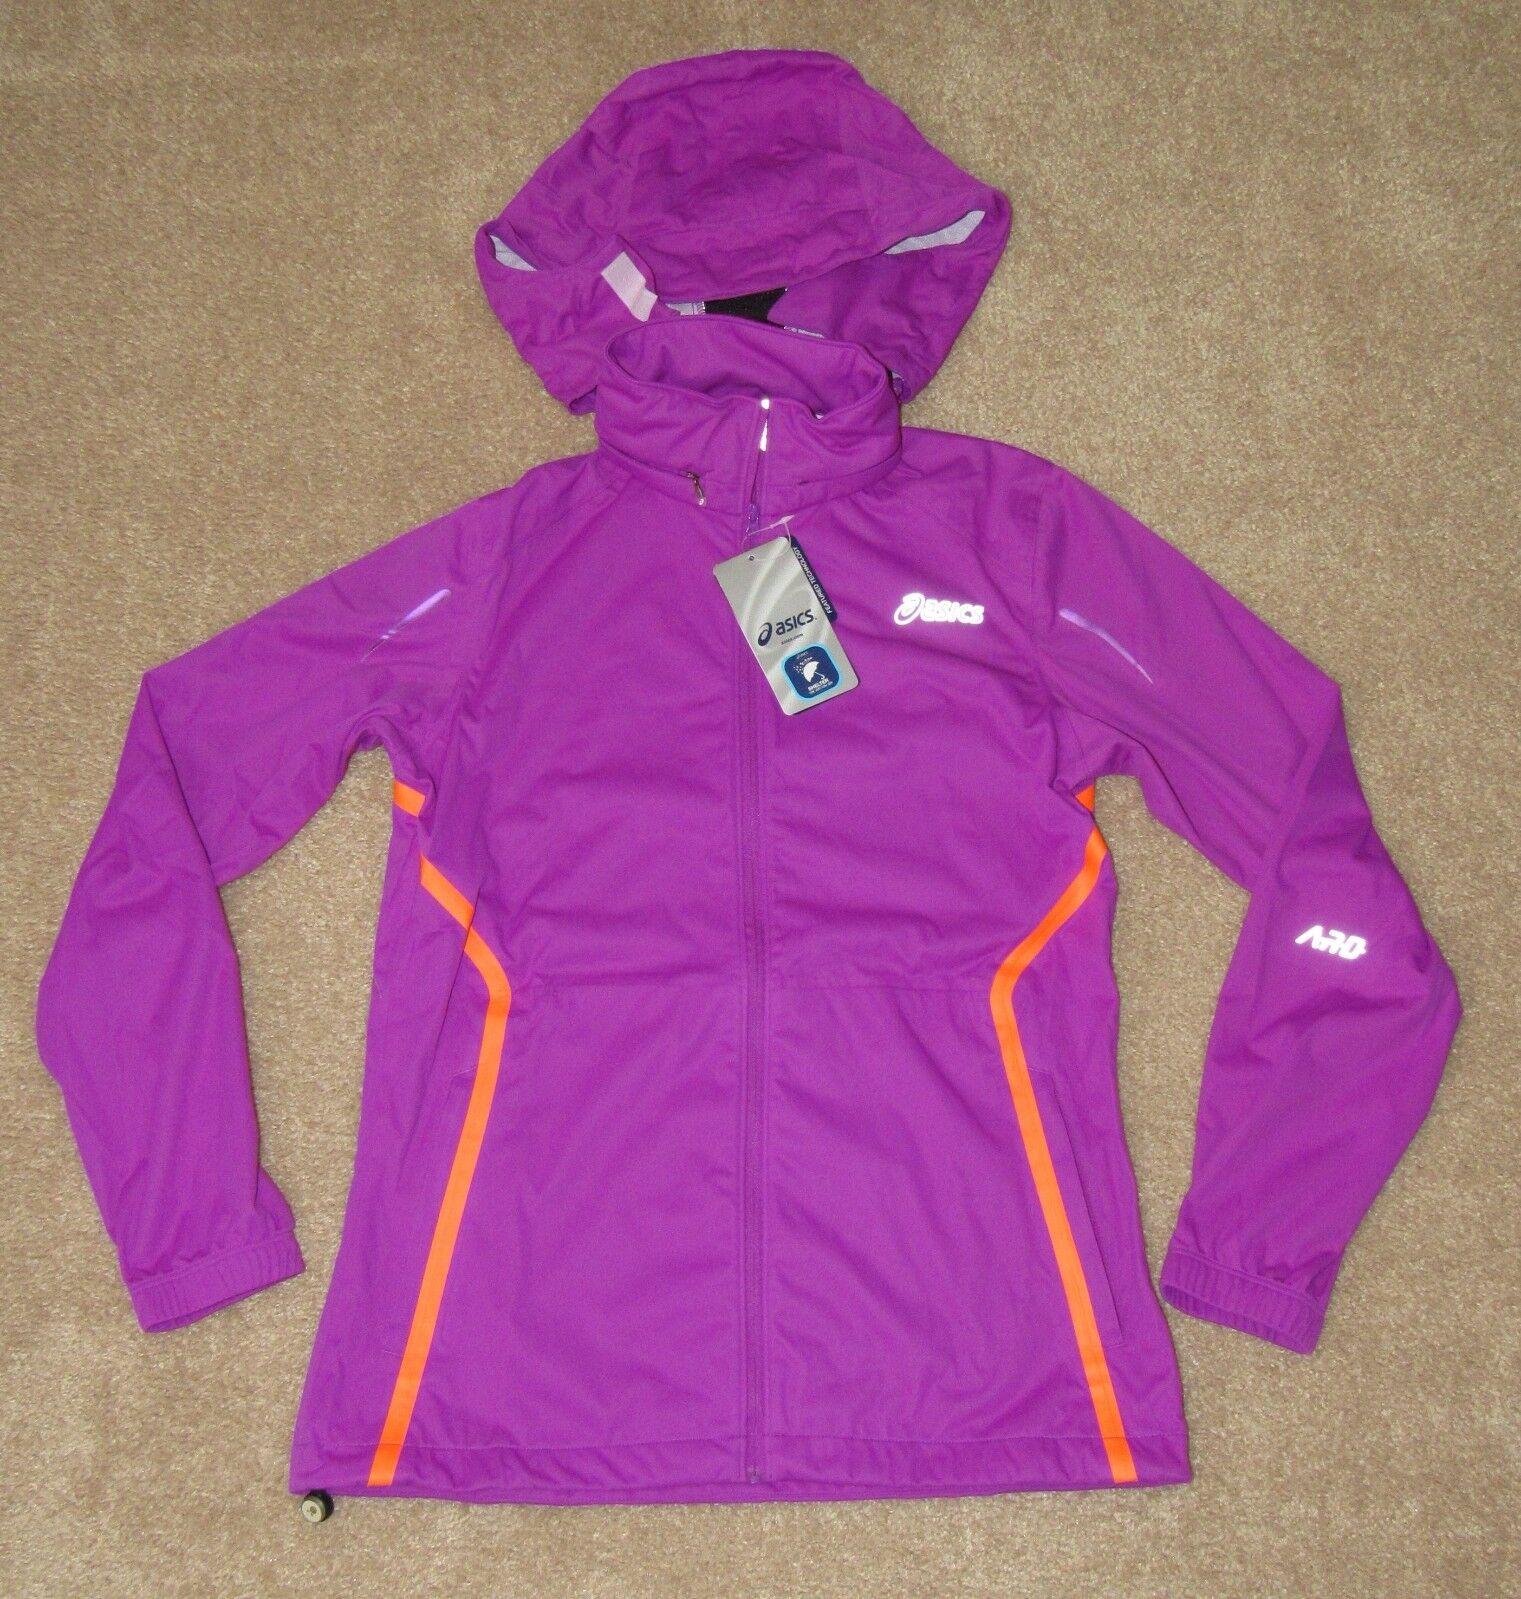 ASICS ARD Femme Running Veste à capuche lila WT1815 Pop-M